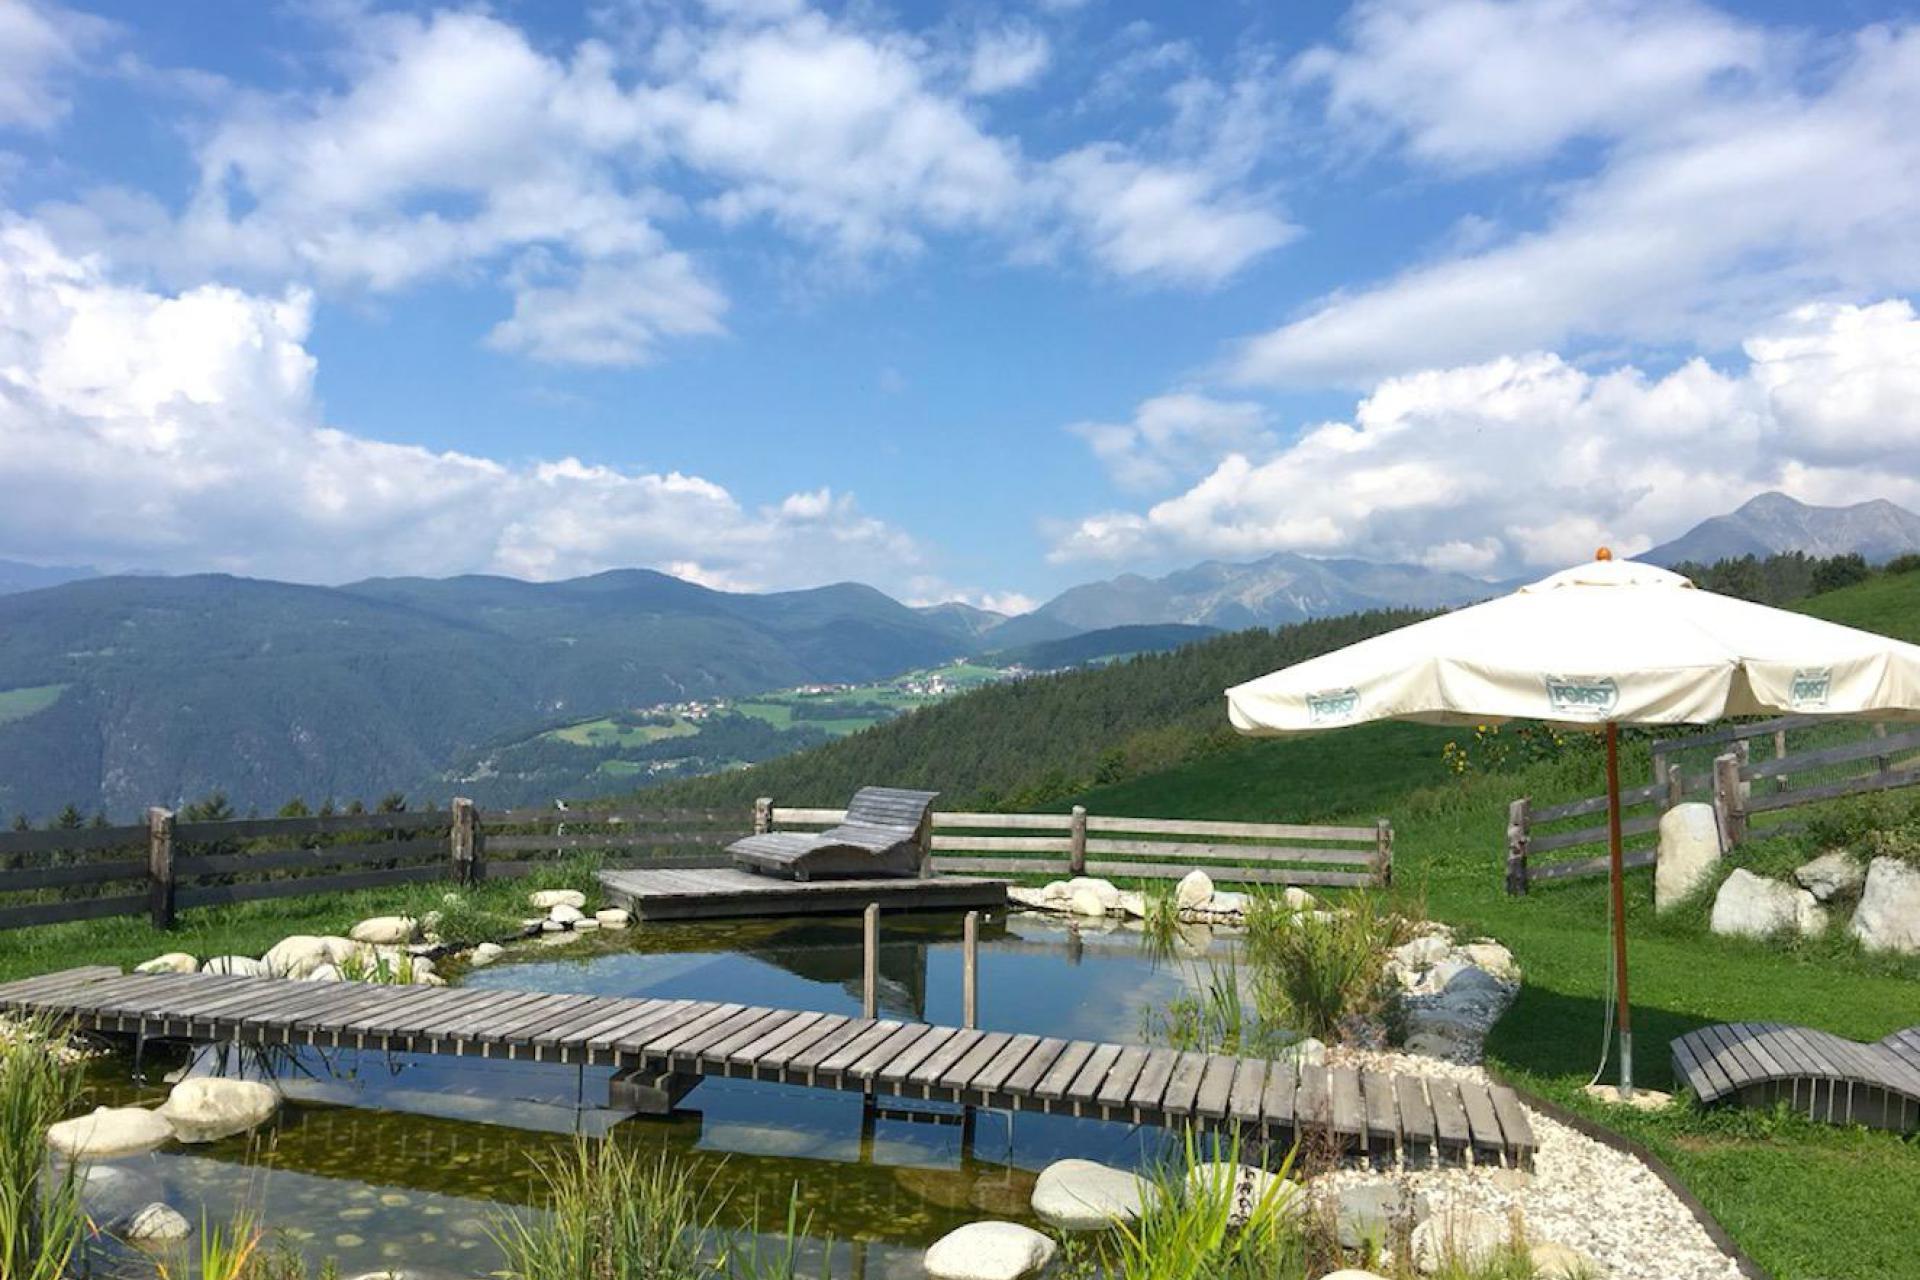 Agriturismo Dolomieten Actieve agriturismo met boerderijdieren in Trentino